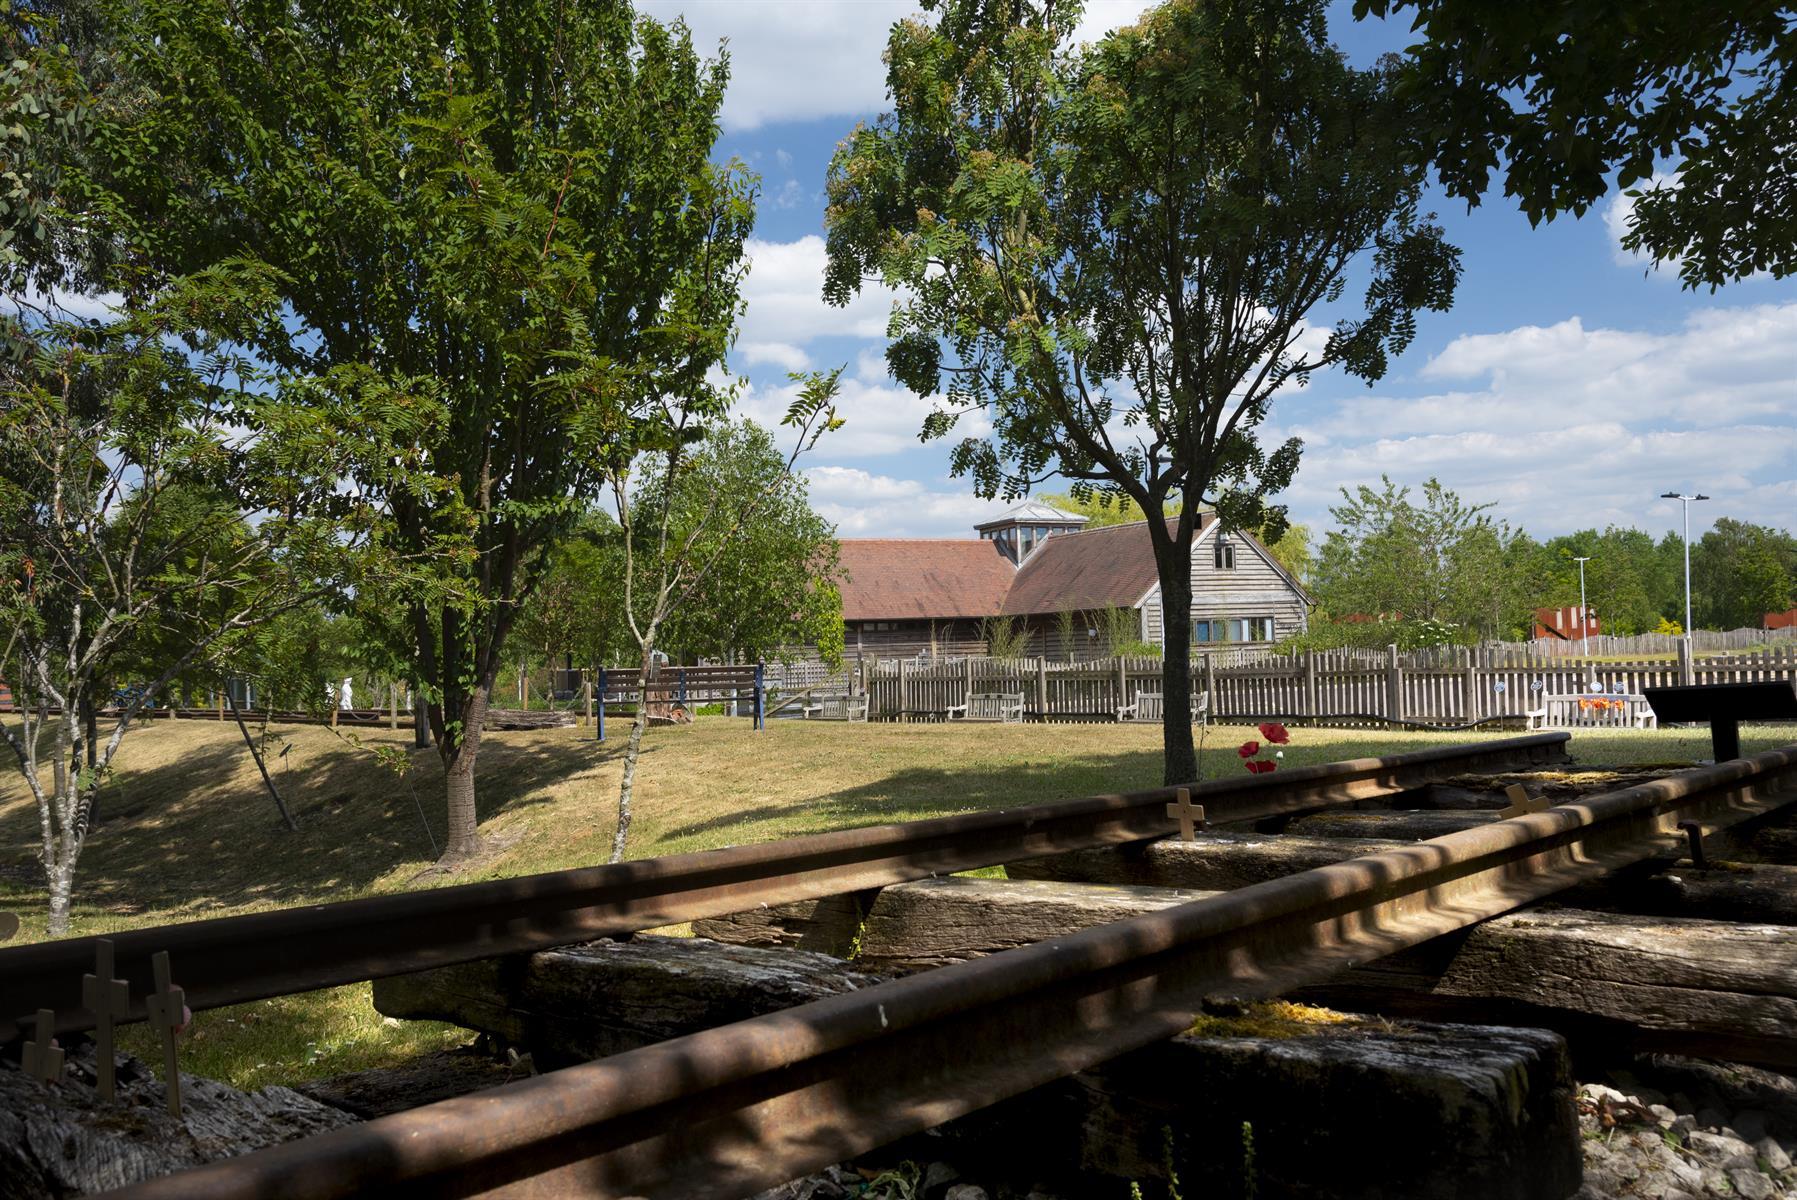 The Burma Railway Memorial - includes original track and sleepers